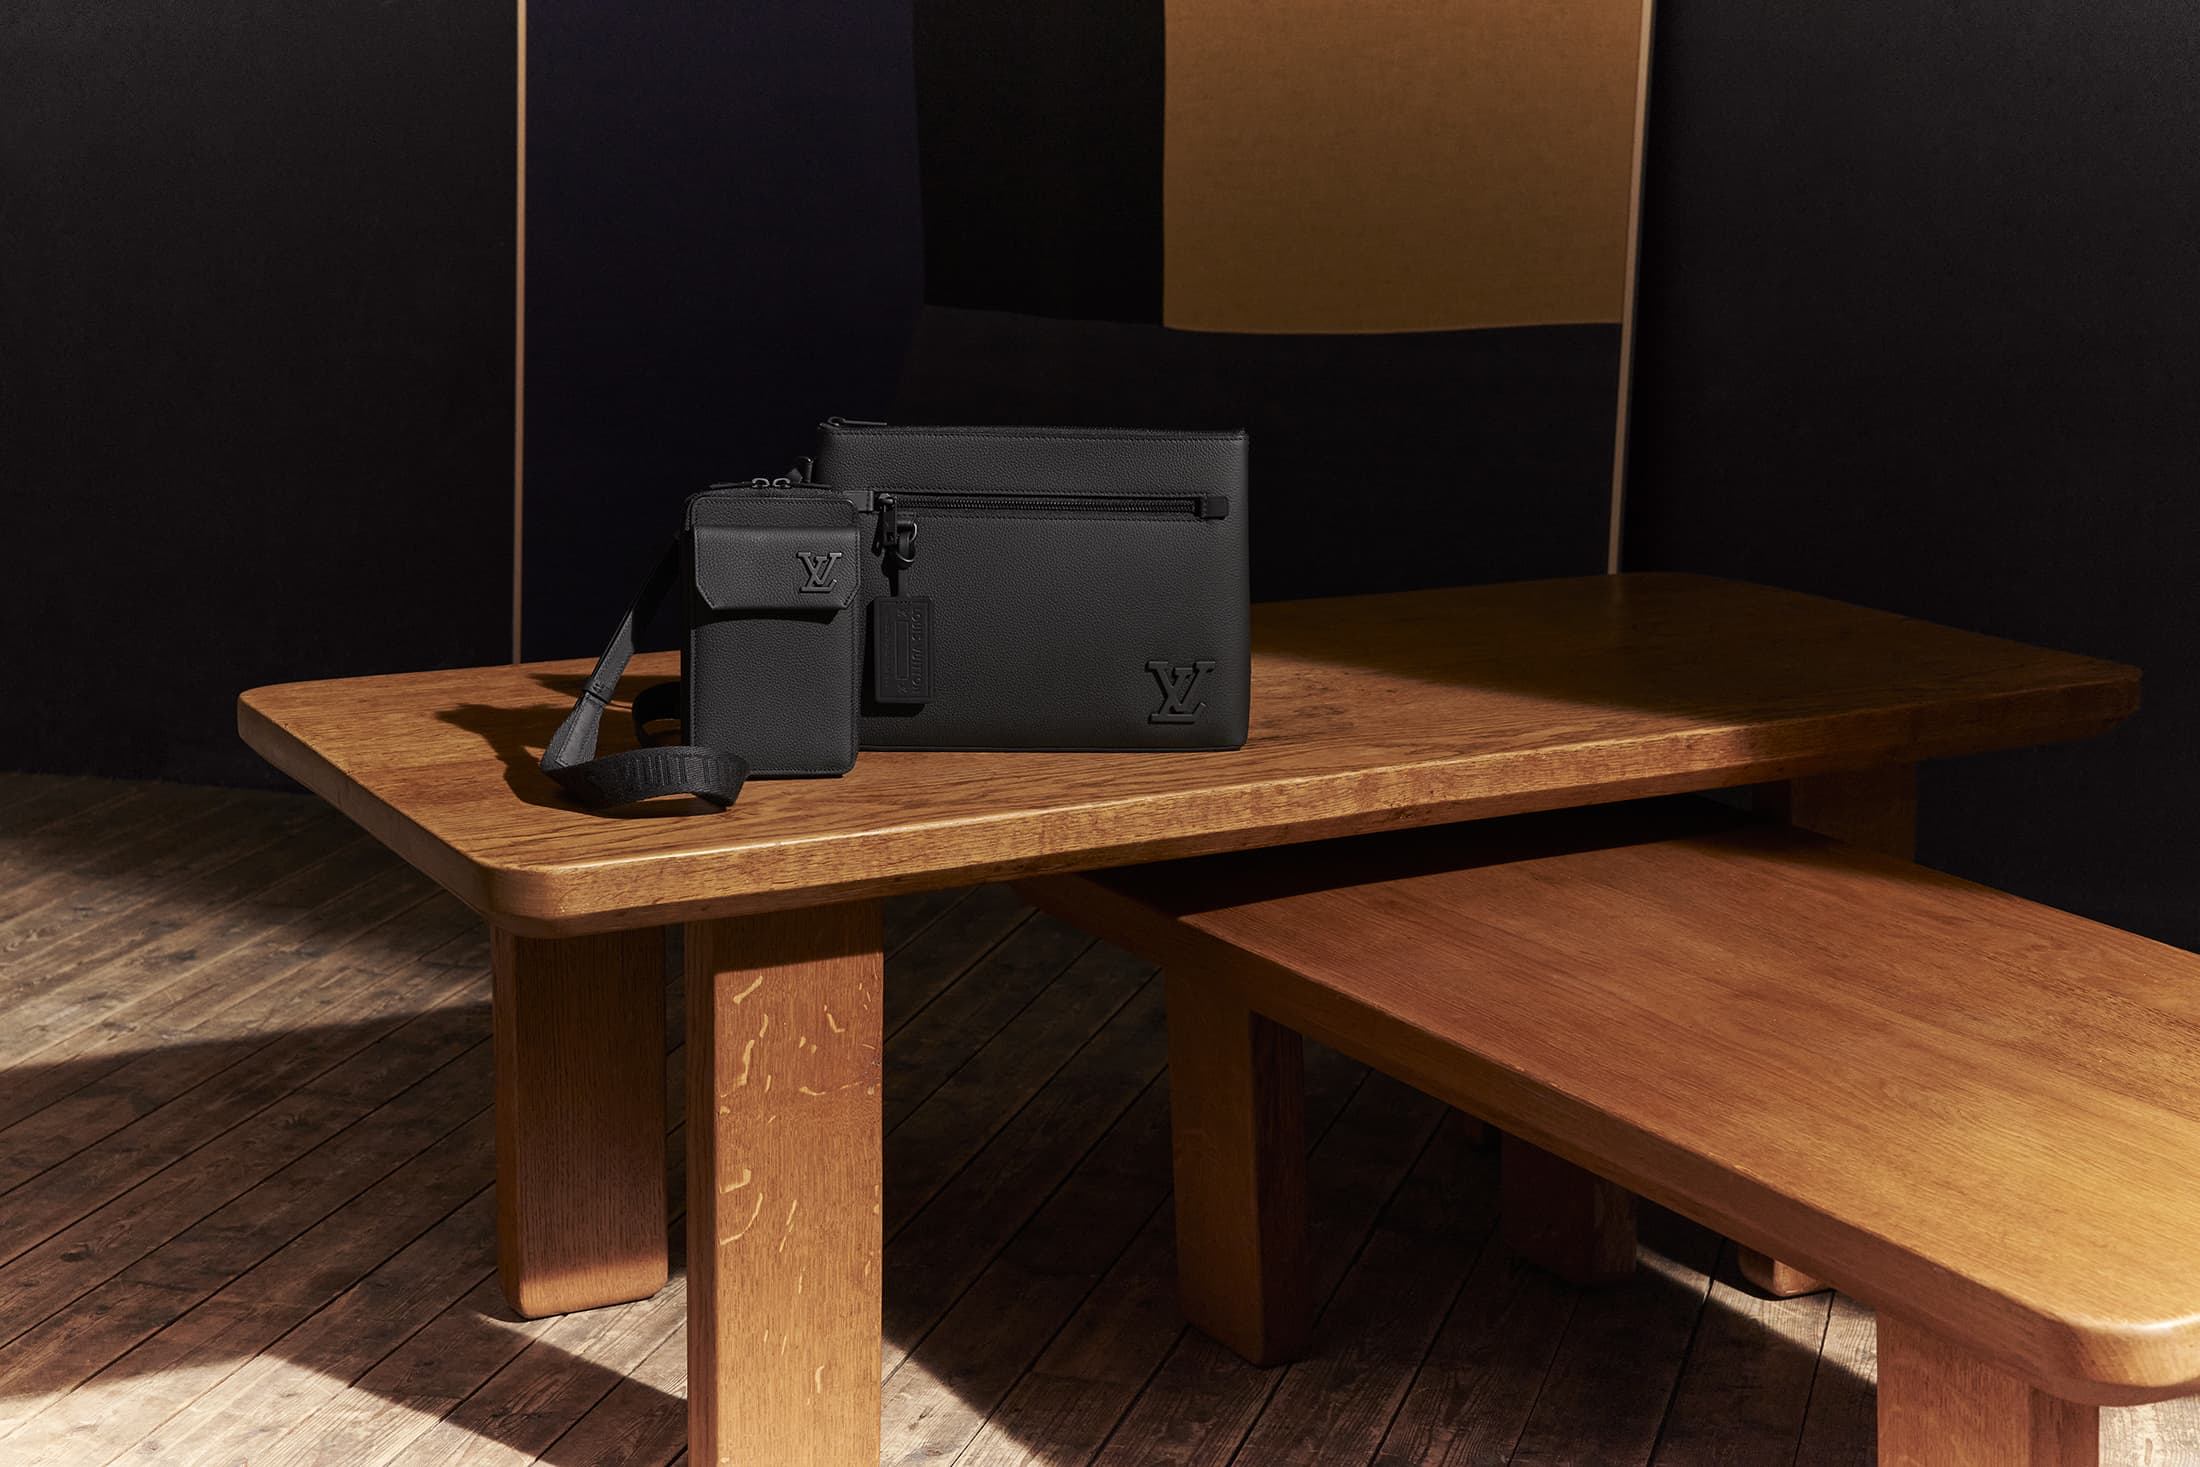 Louis Vuitton Aerogram Men's Leather Goods Collection